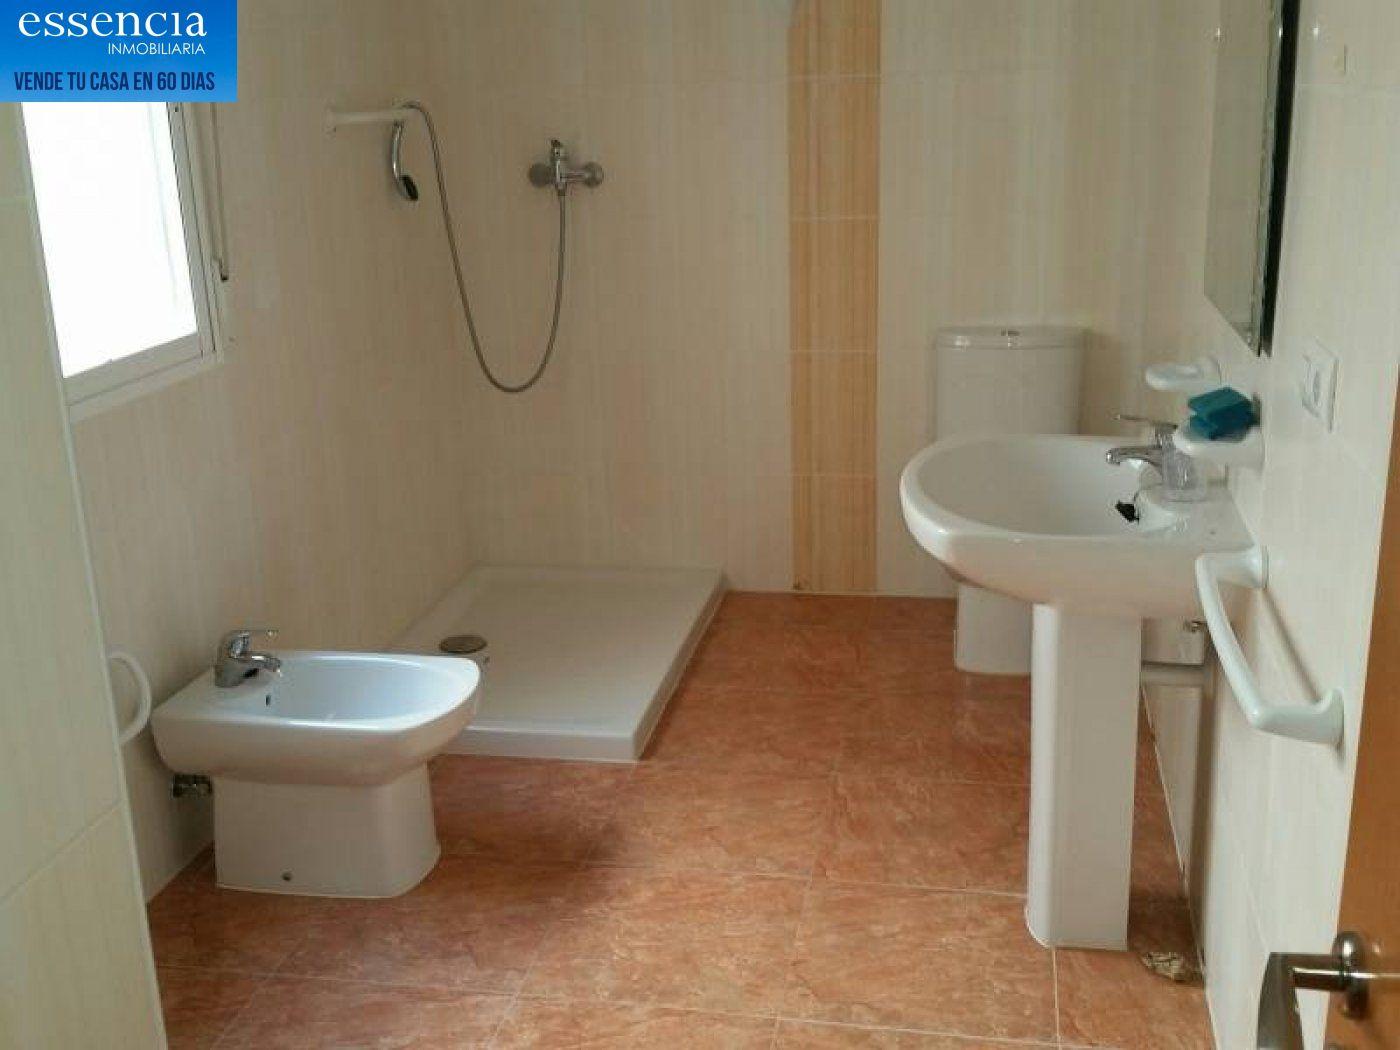 Oferta sin visitar. piso en oliva con ascensor, calle isaac albeniz - imagenInmueble22